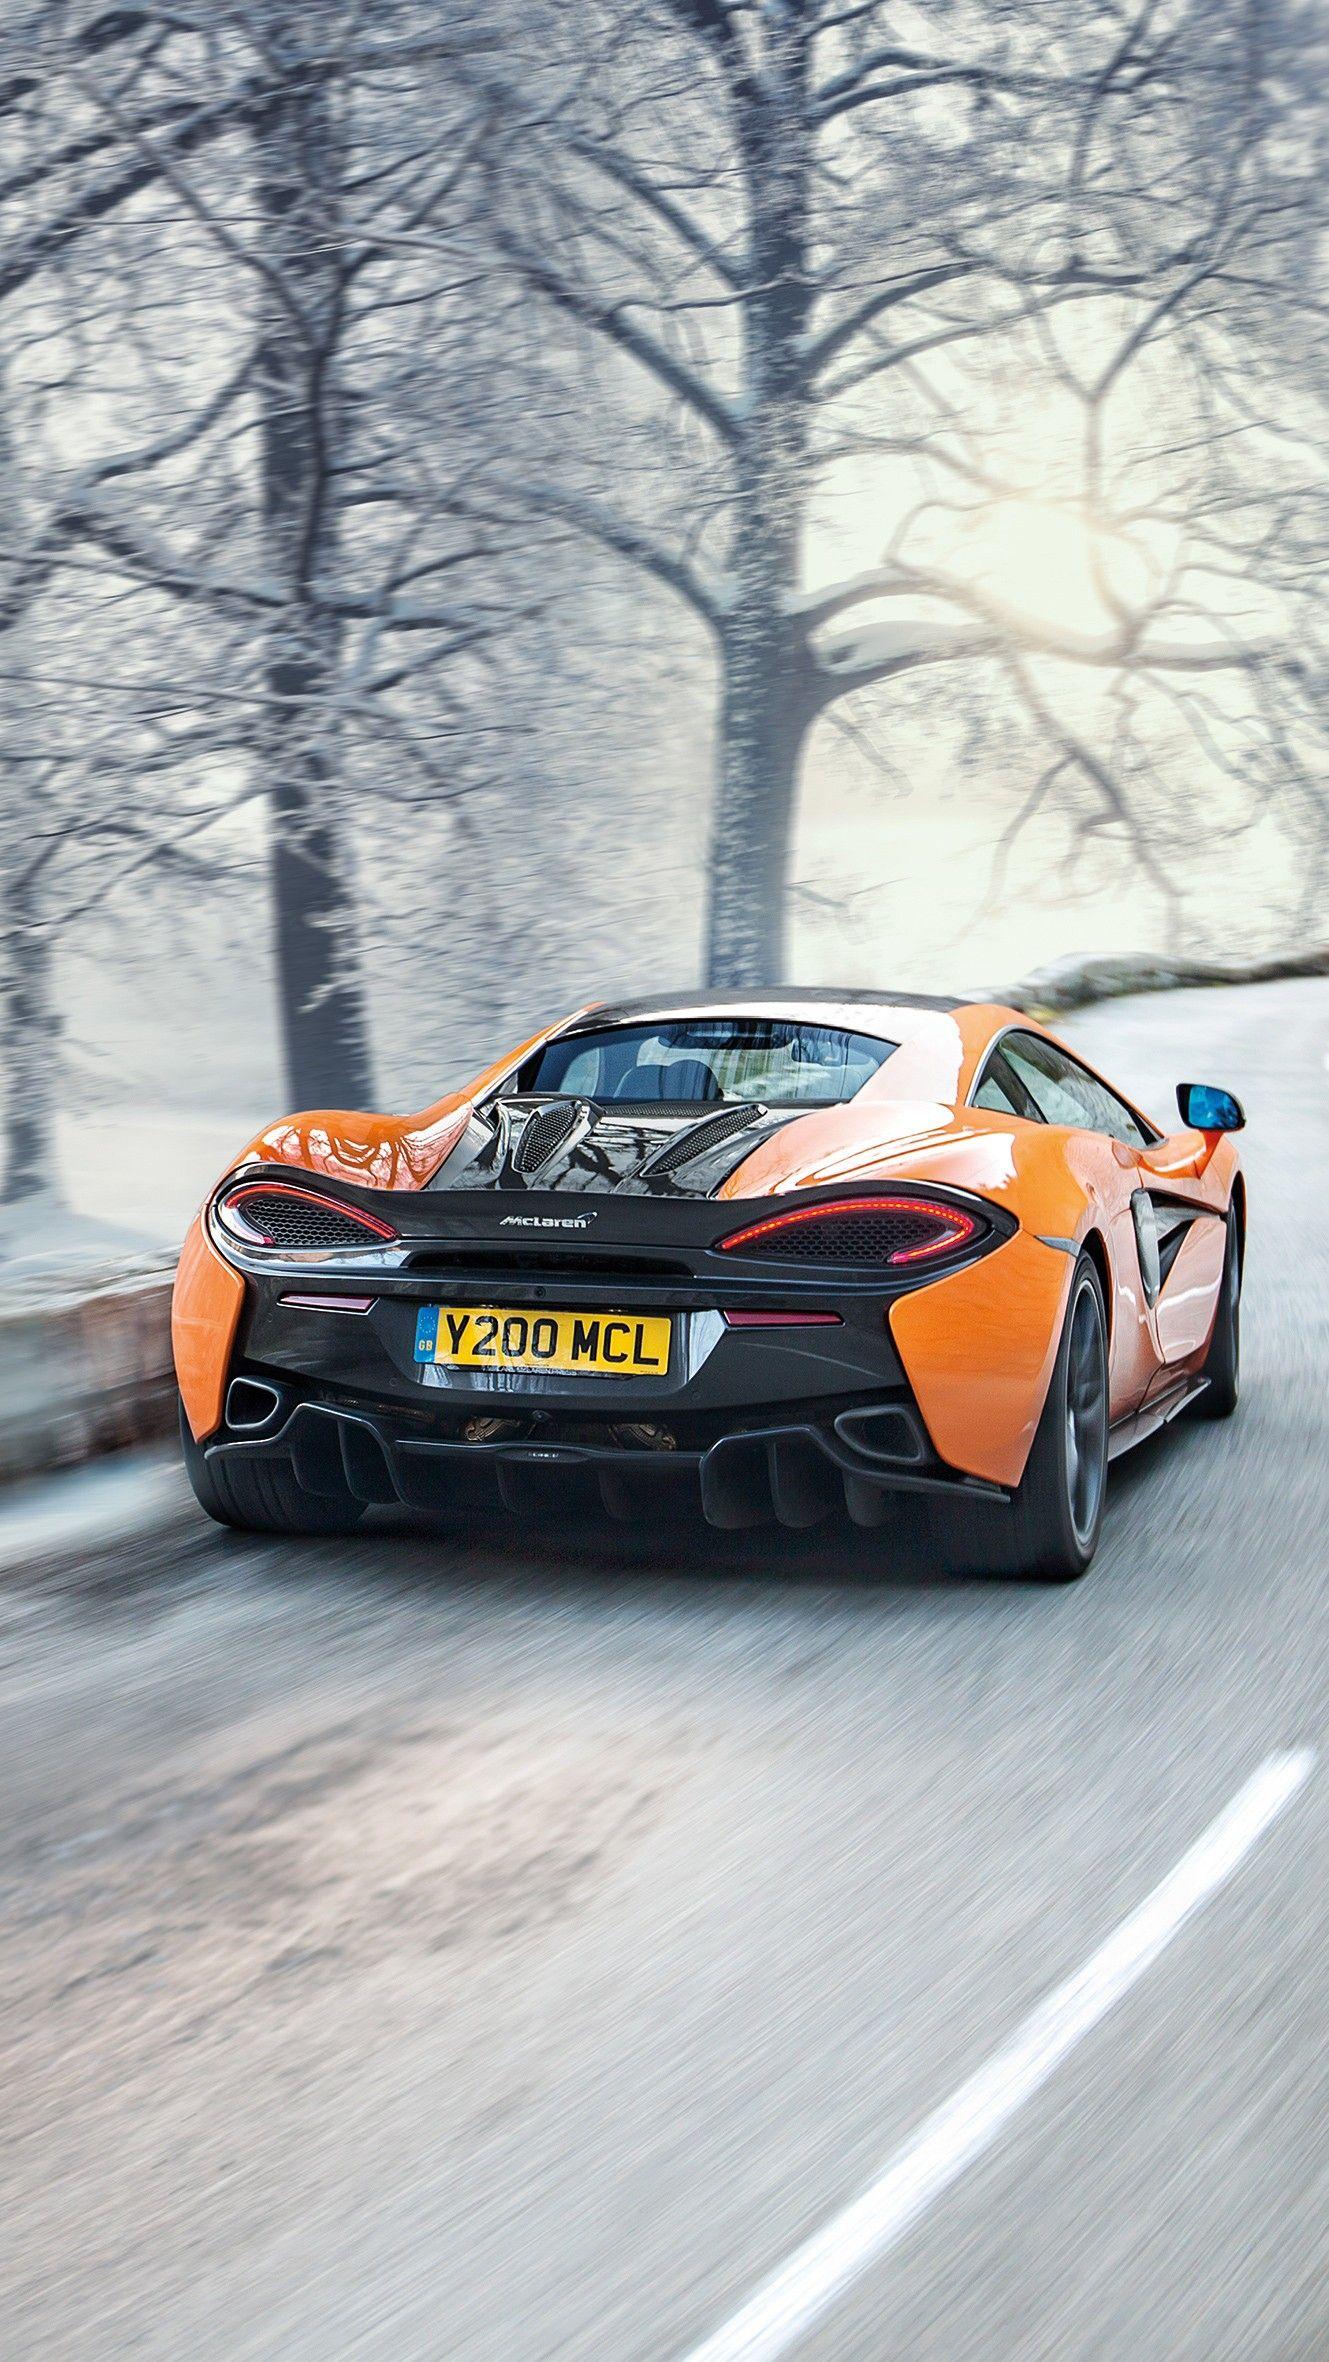 Mclaren Cool Hd Wallpaper In 2020 Car Iphone Wallpaper Super Cars Car Backgrounds